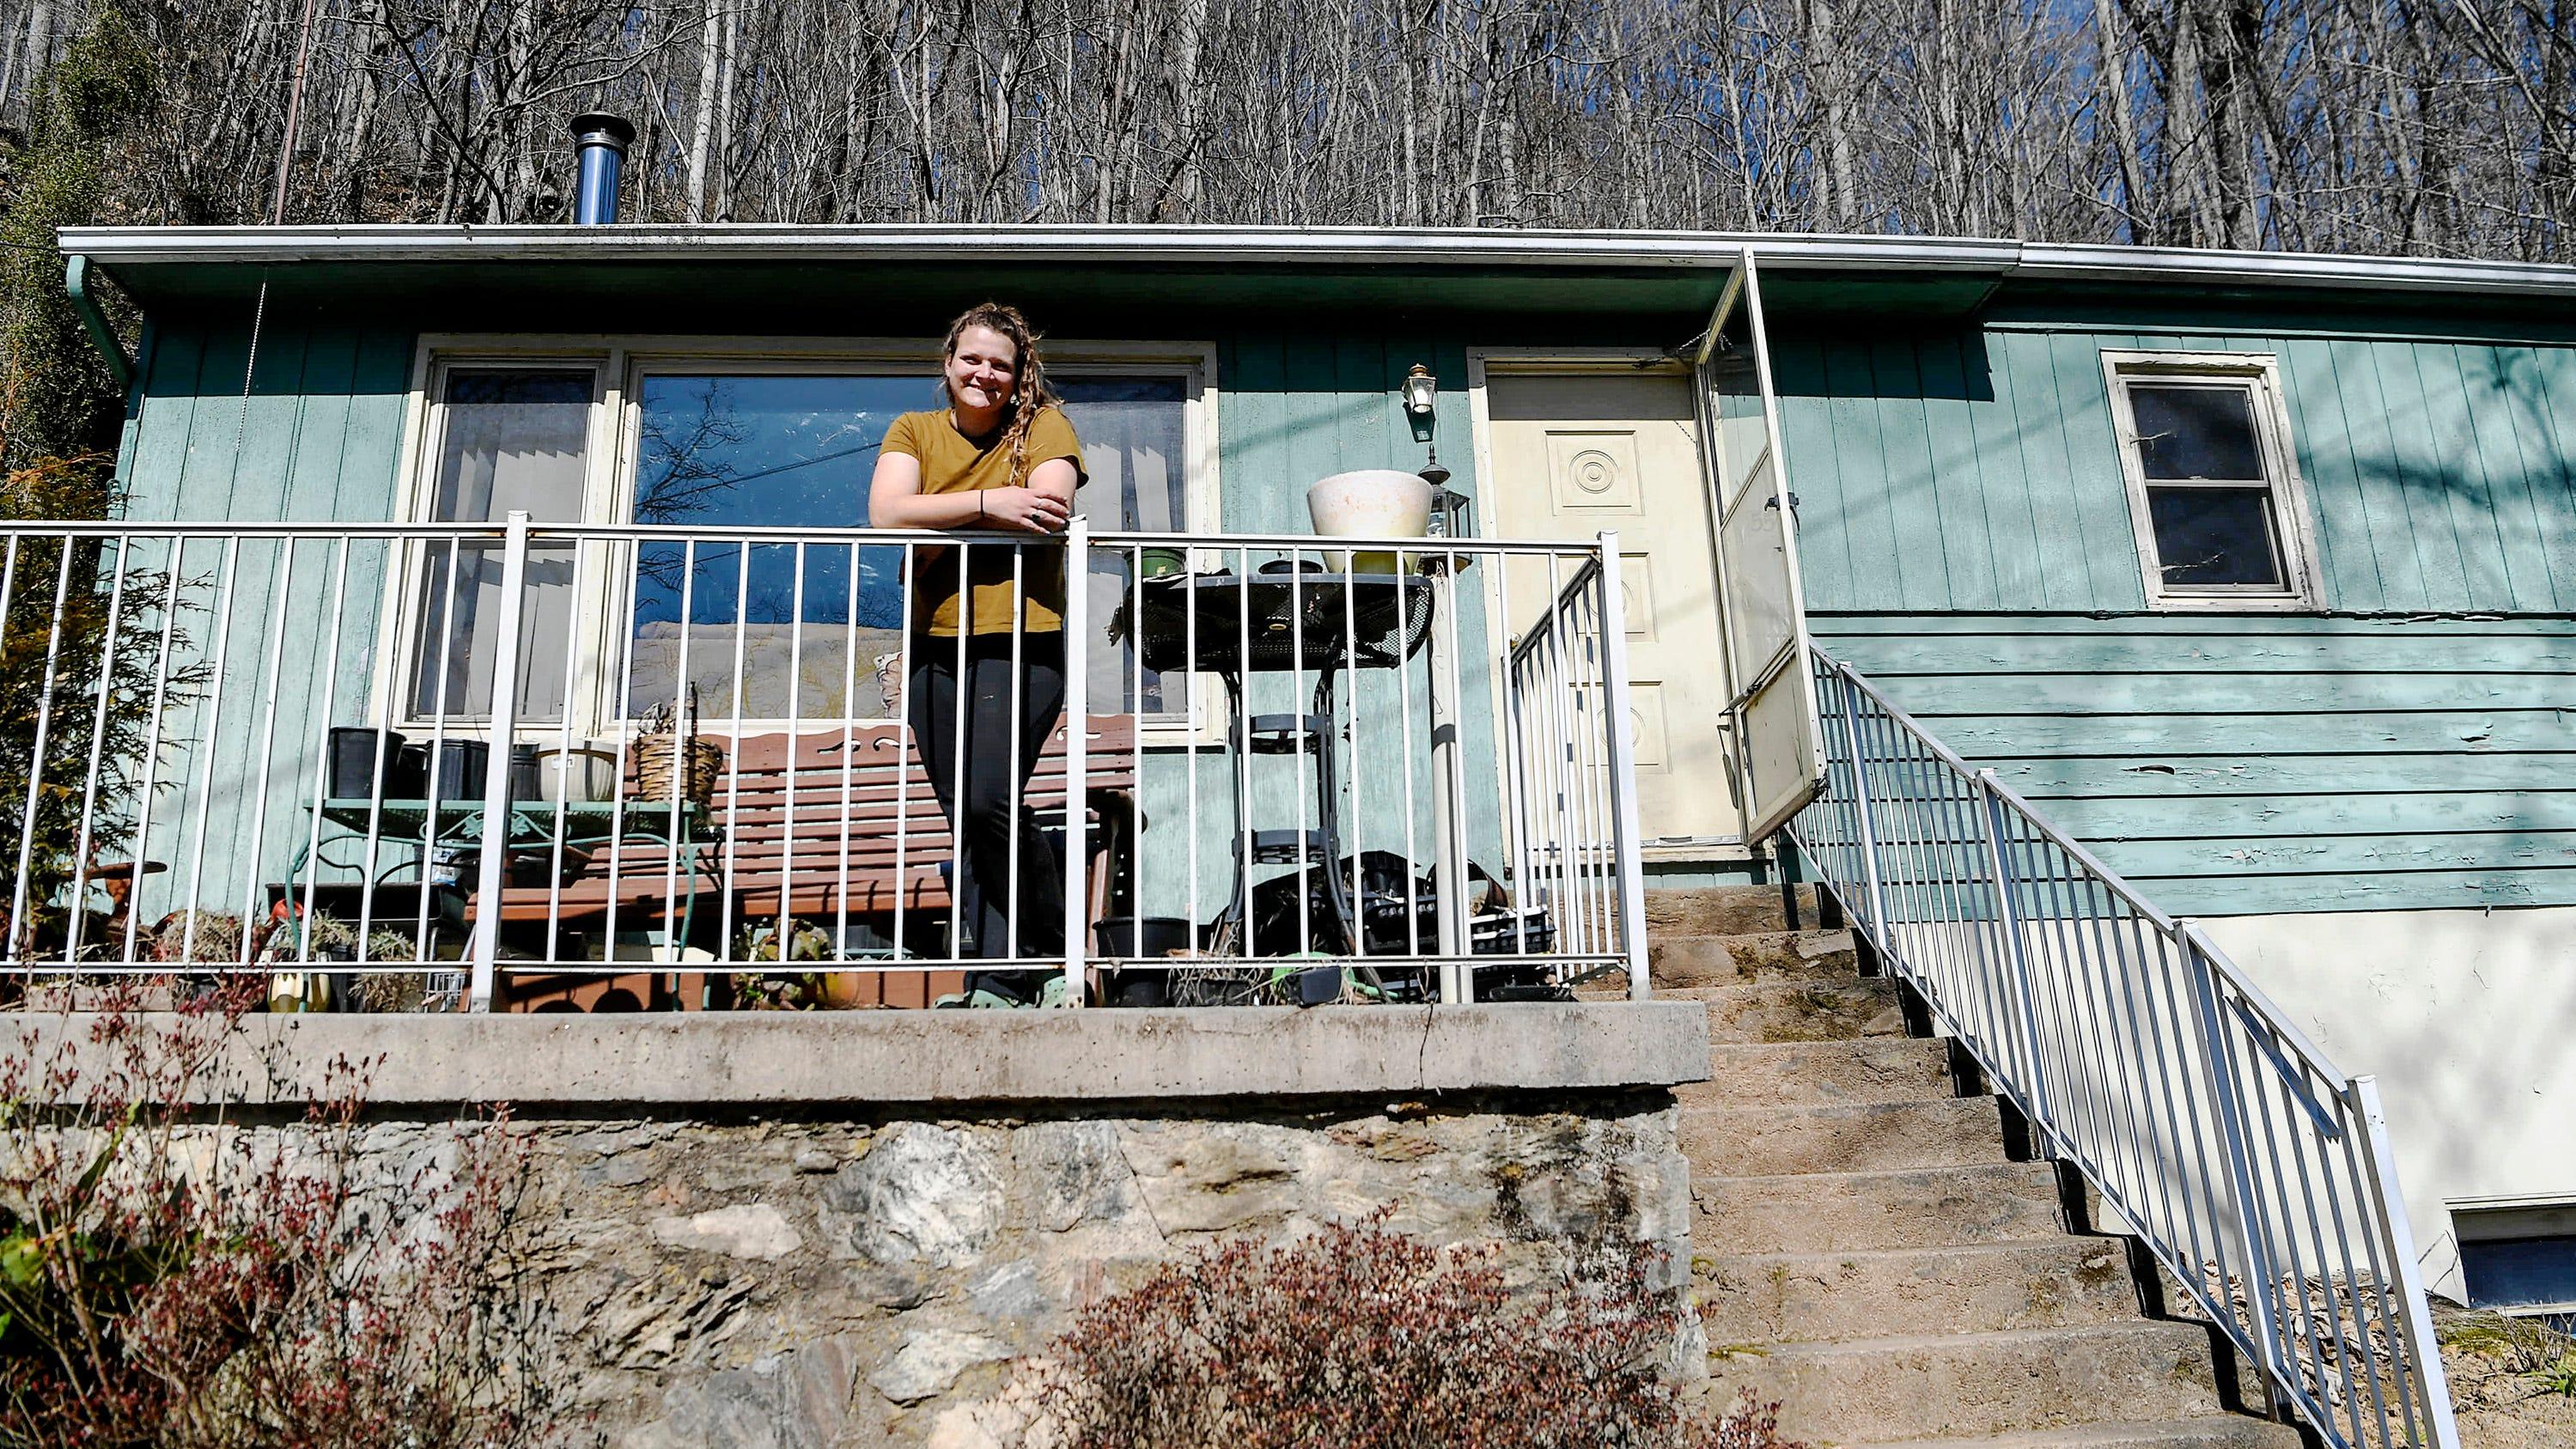 Rachel Baran at her home in Waynesville March 8, 2021.